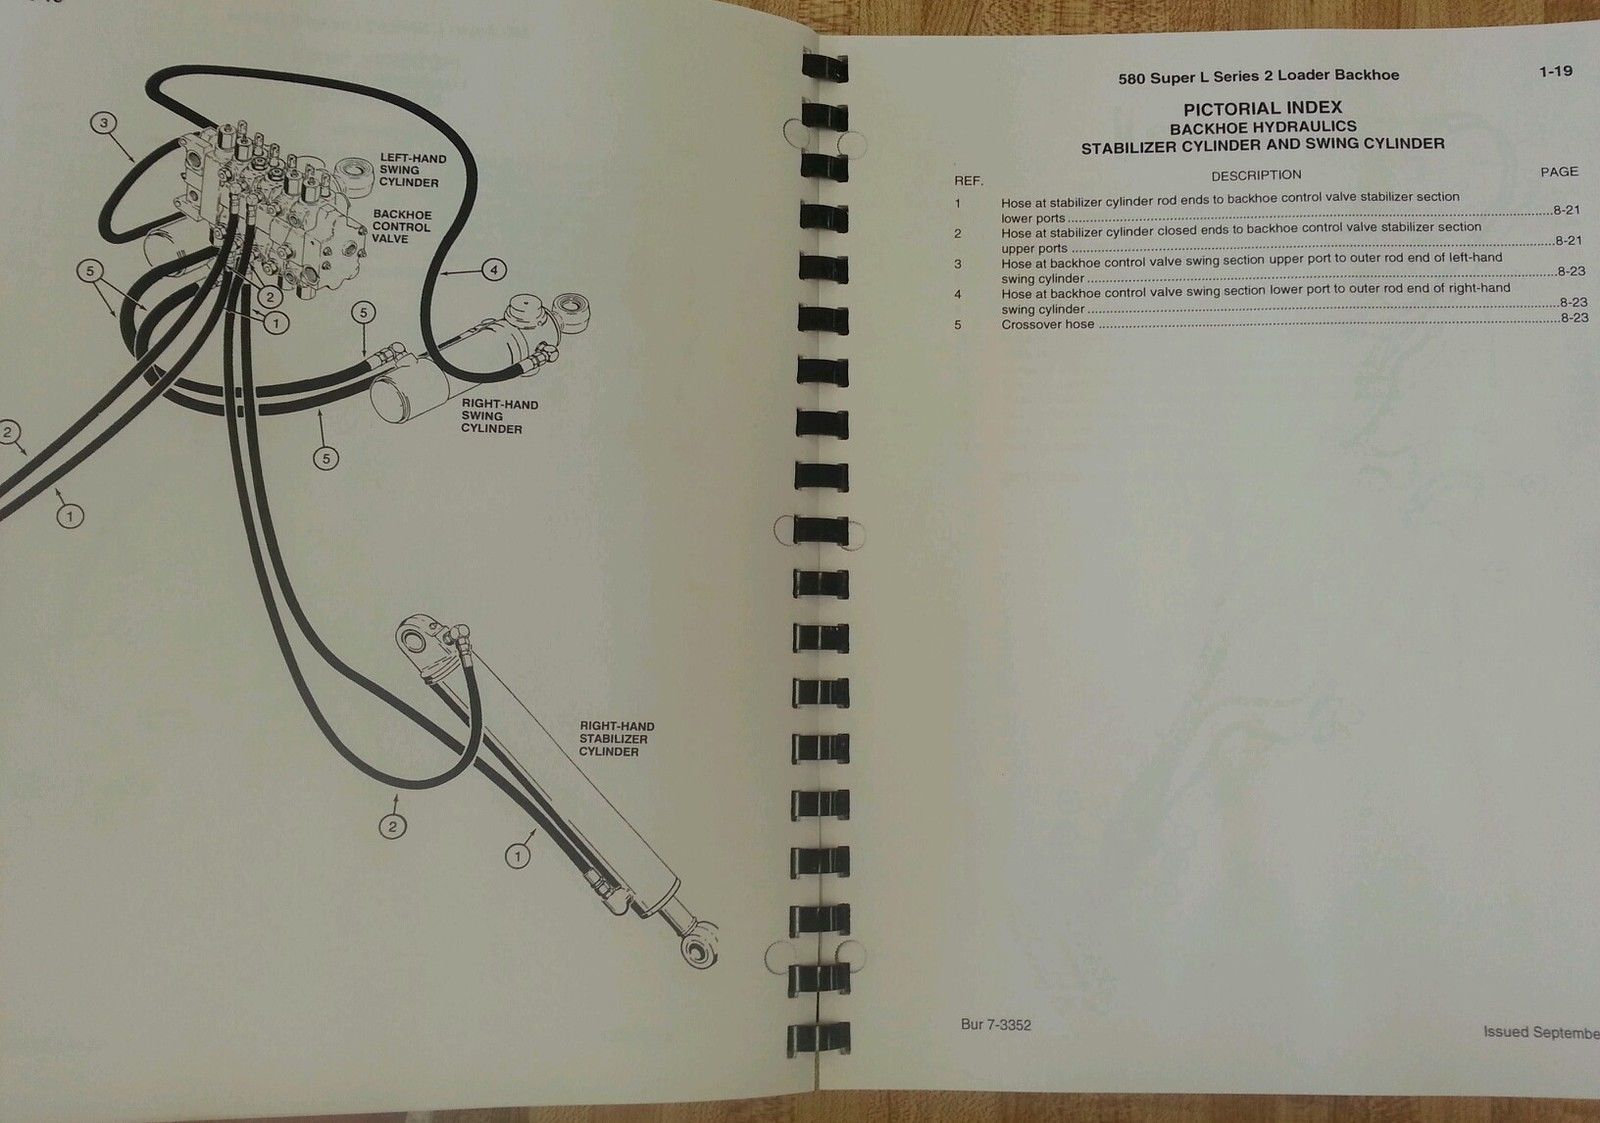 Case 580 Super L Series 2 Ii Loader Backhoe Parts Manual Book 580sl Kobelco Wiring Diagram